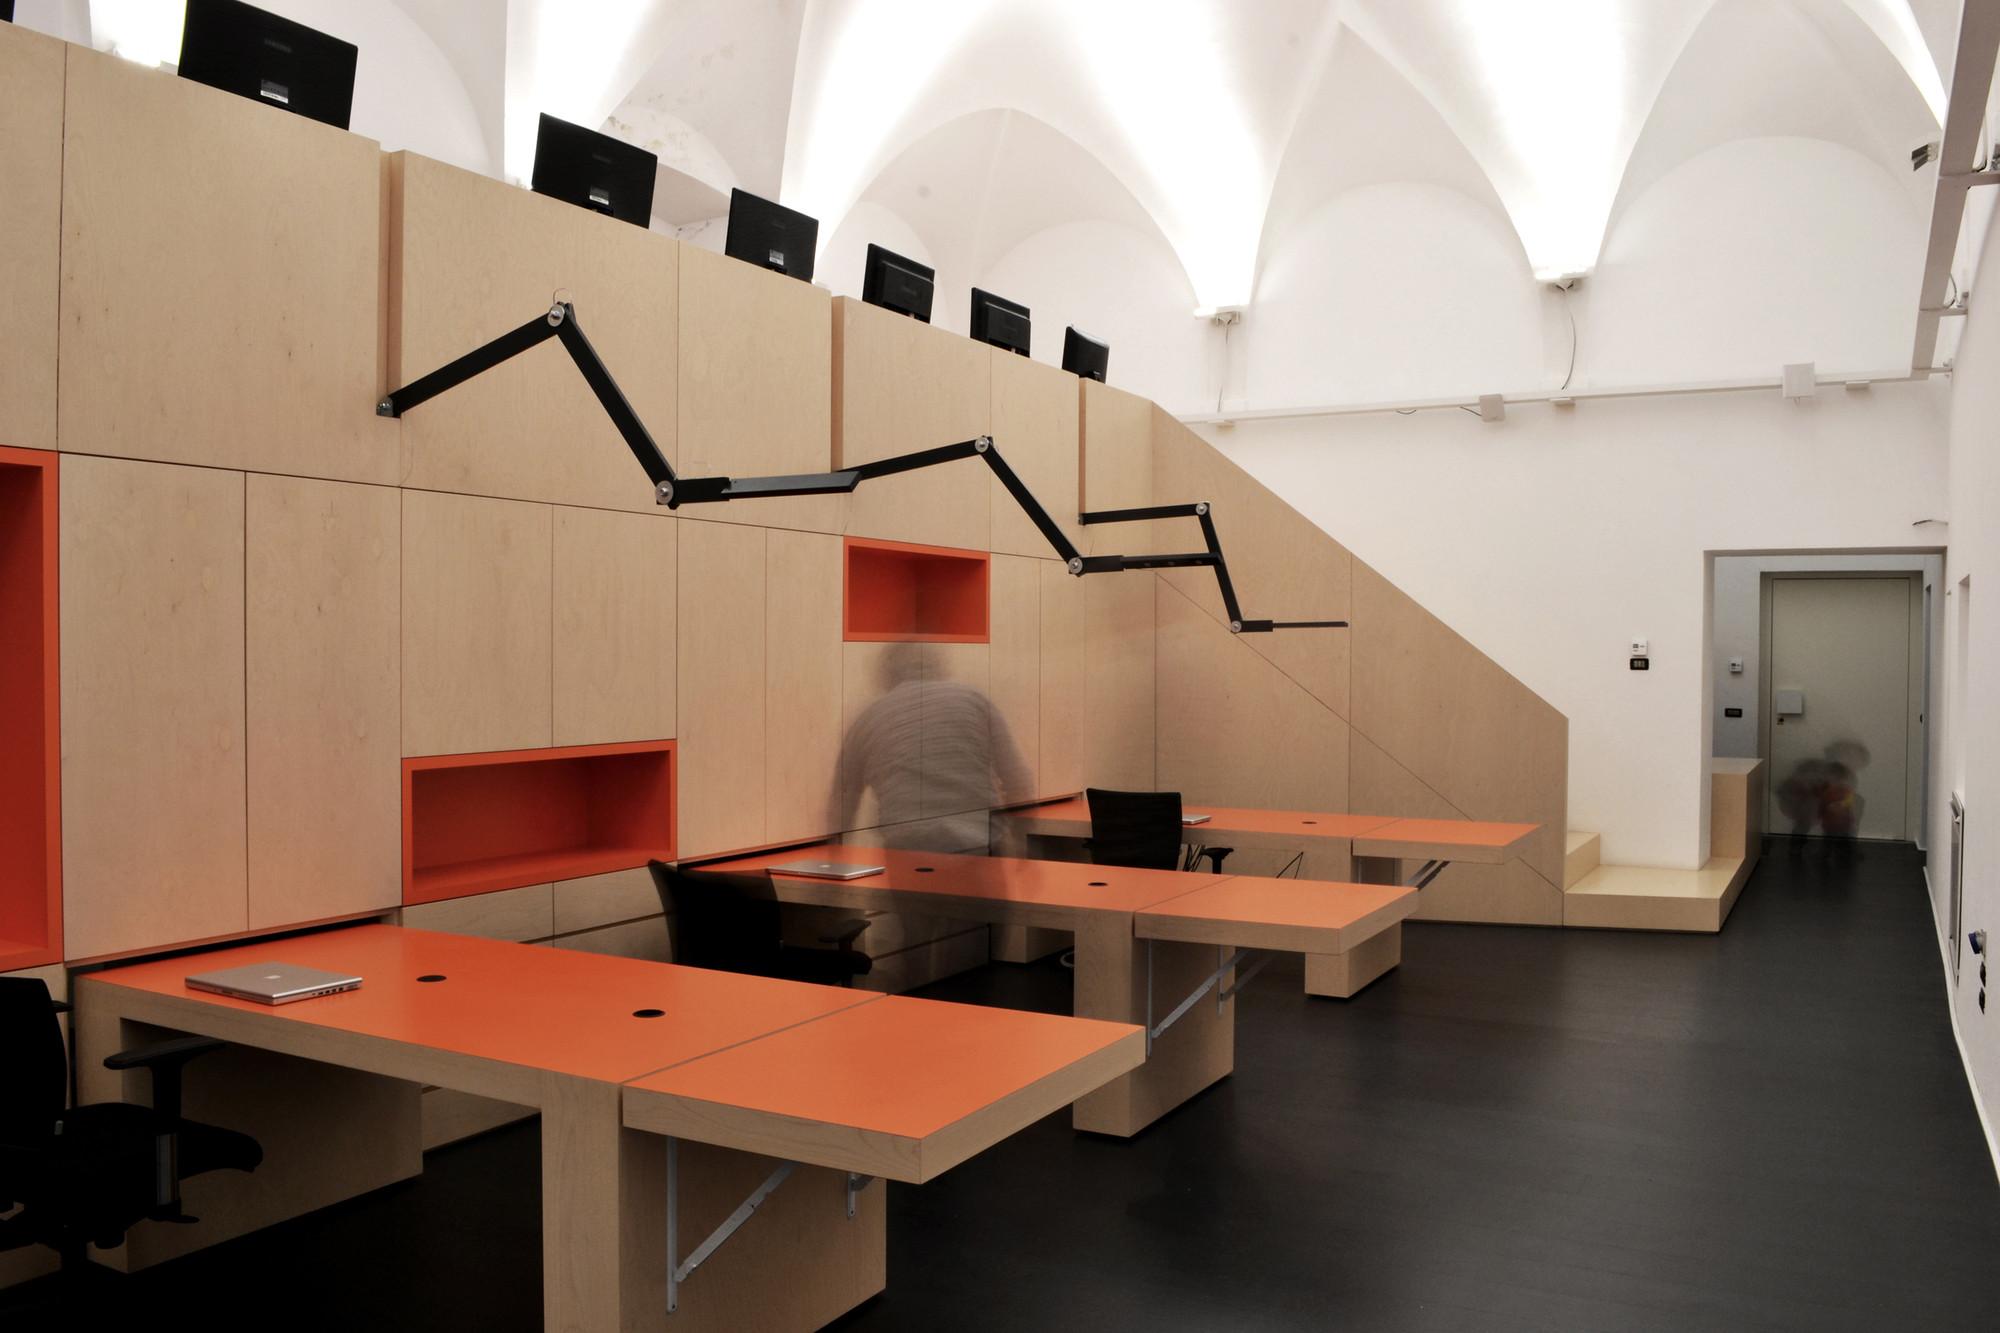 A917 Corporate Headquarters In Pisa / nuvolaB architetti associati, Courtesy of nuvolaB architetti associati